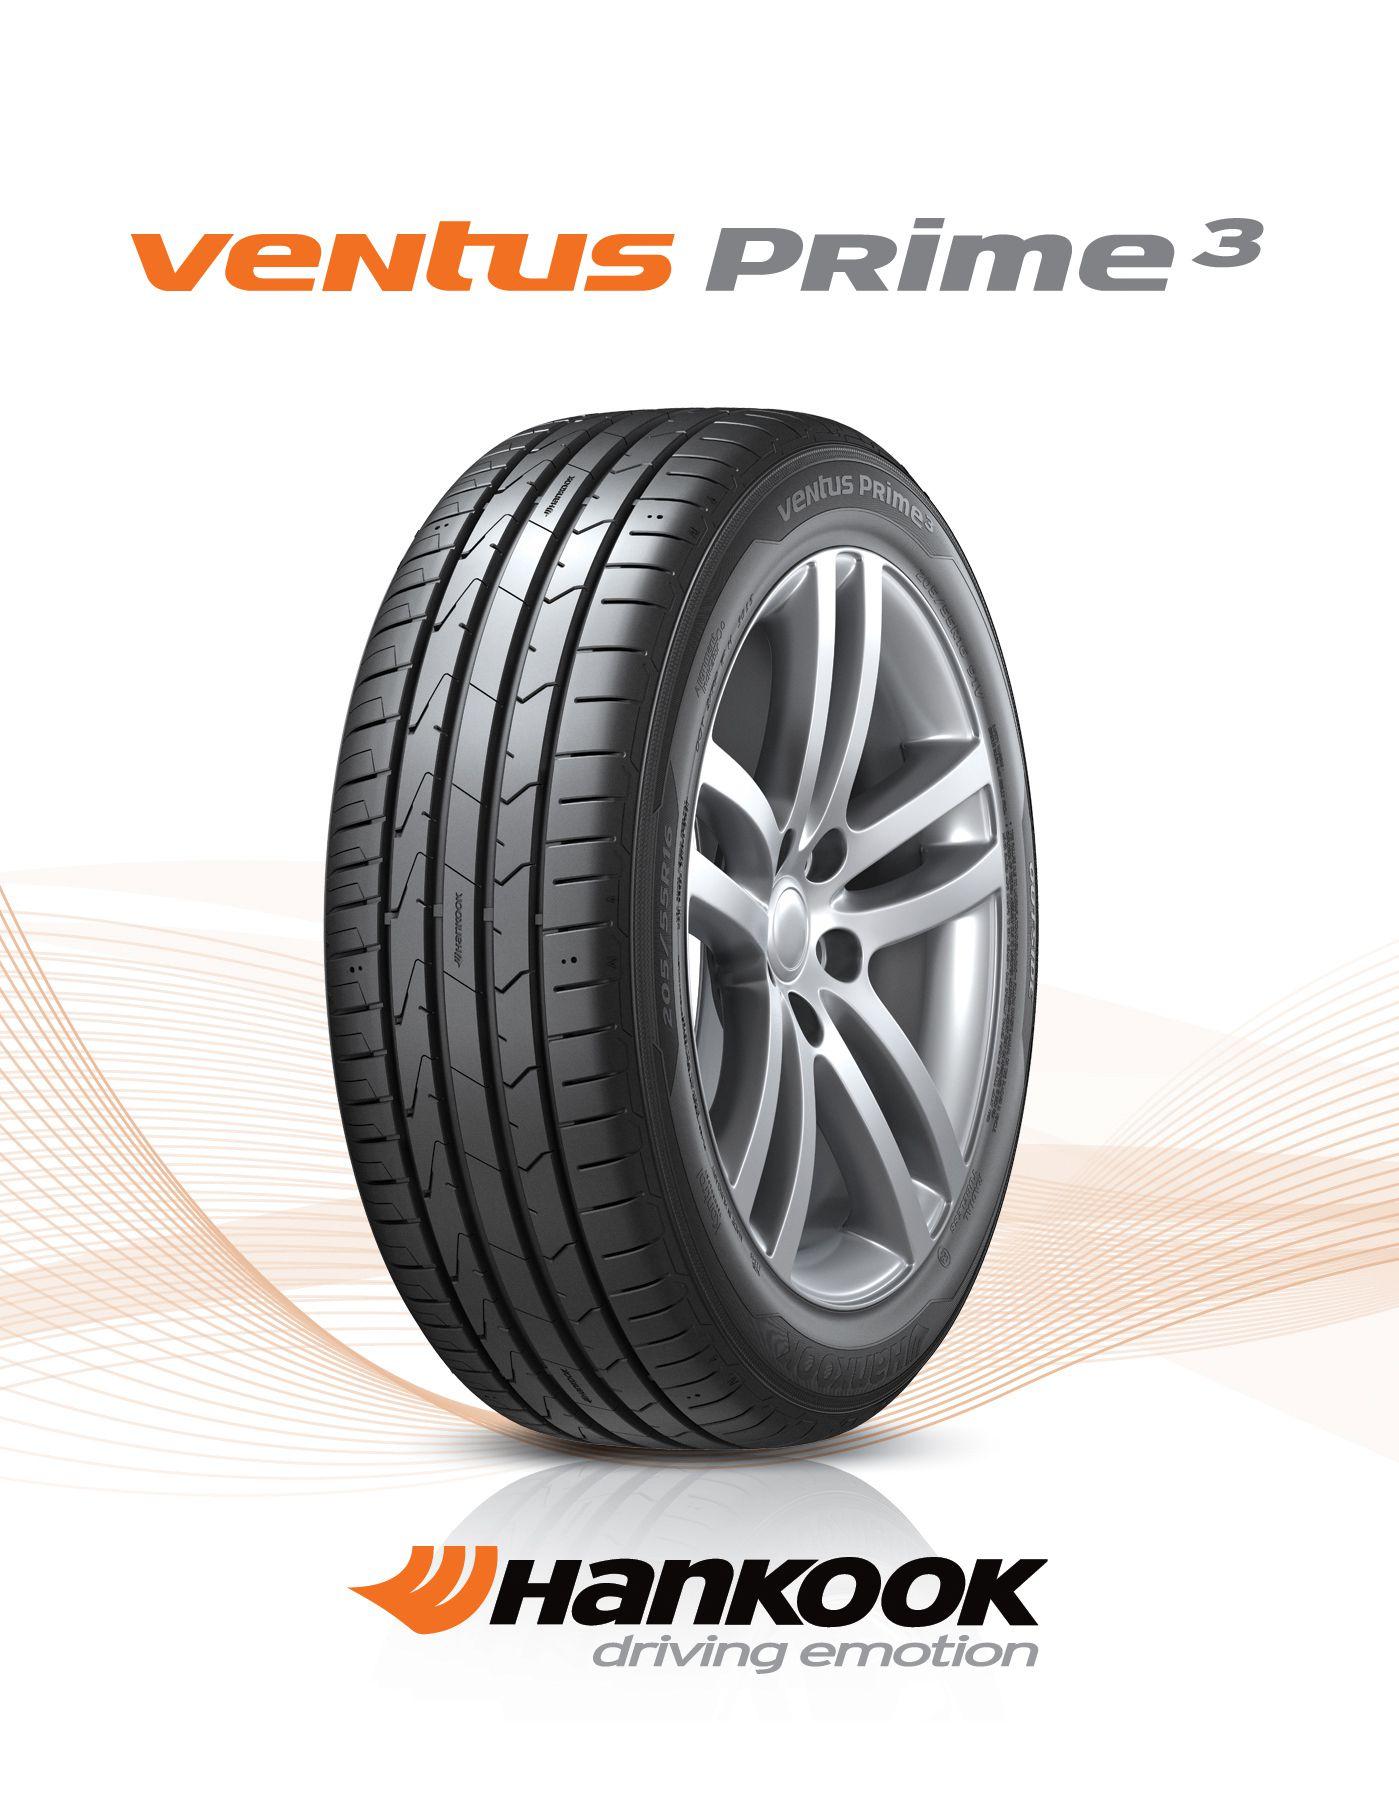 K125_Ventus_Prime_3_1